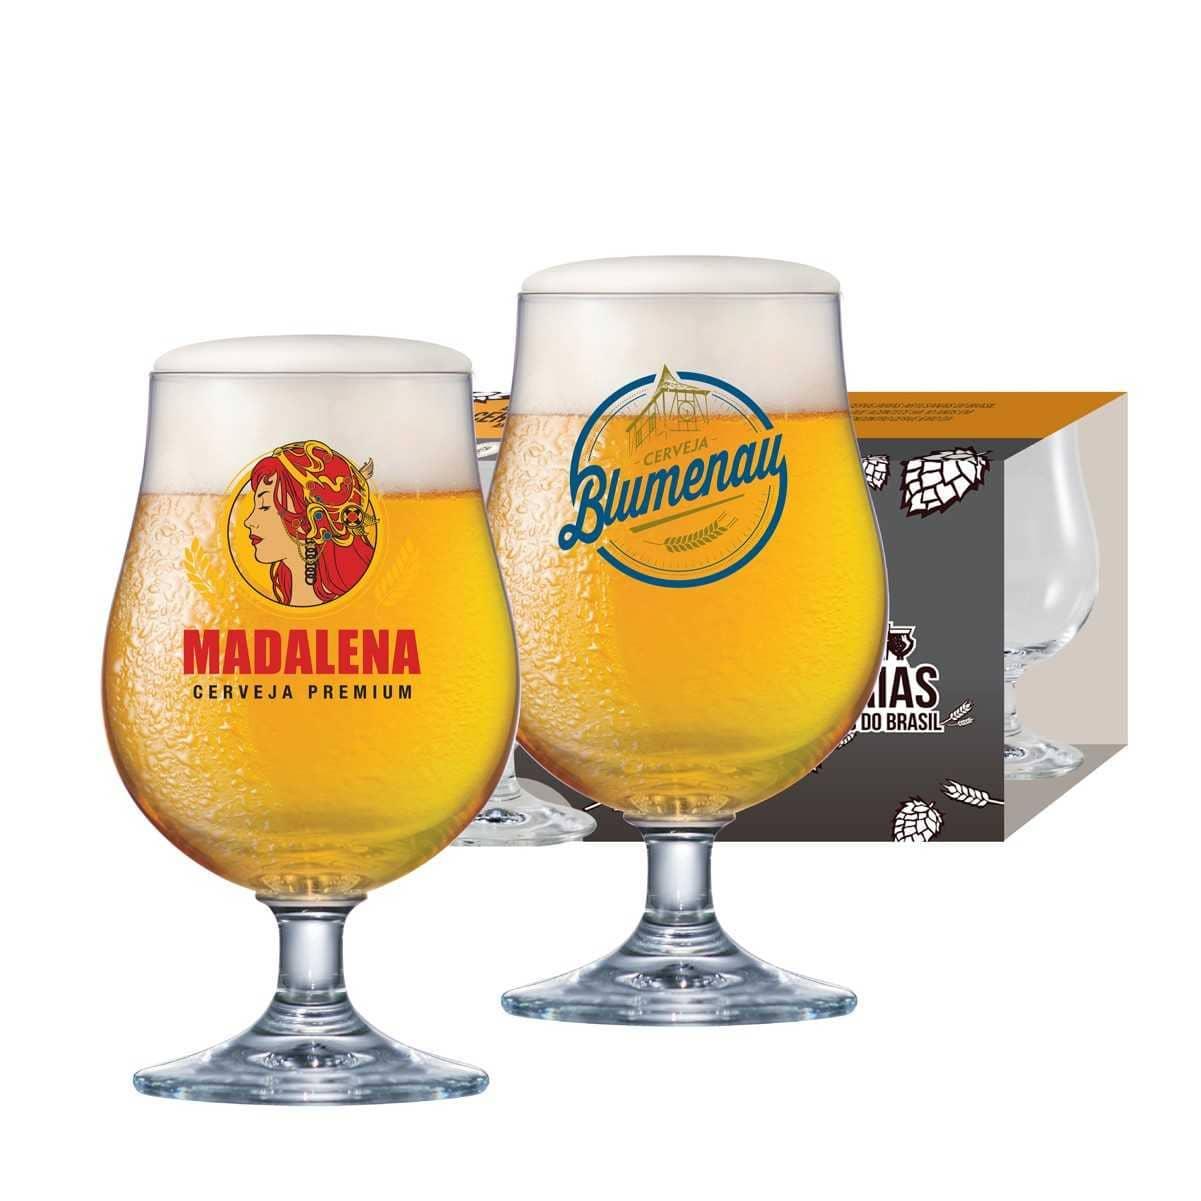 Taças Bock Festival da Cerveja Blumenau/Madalena 380ml